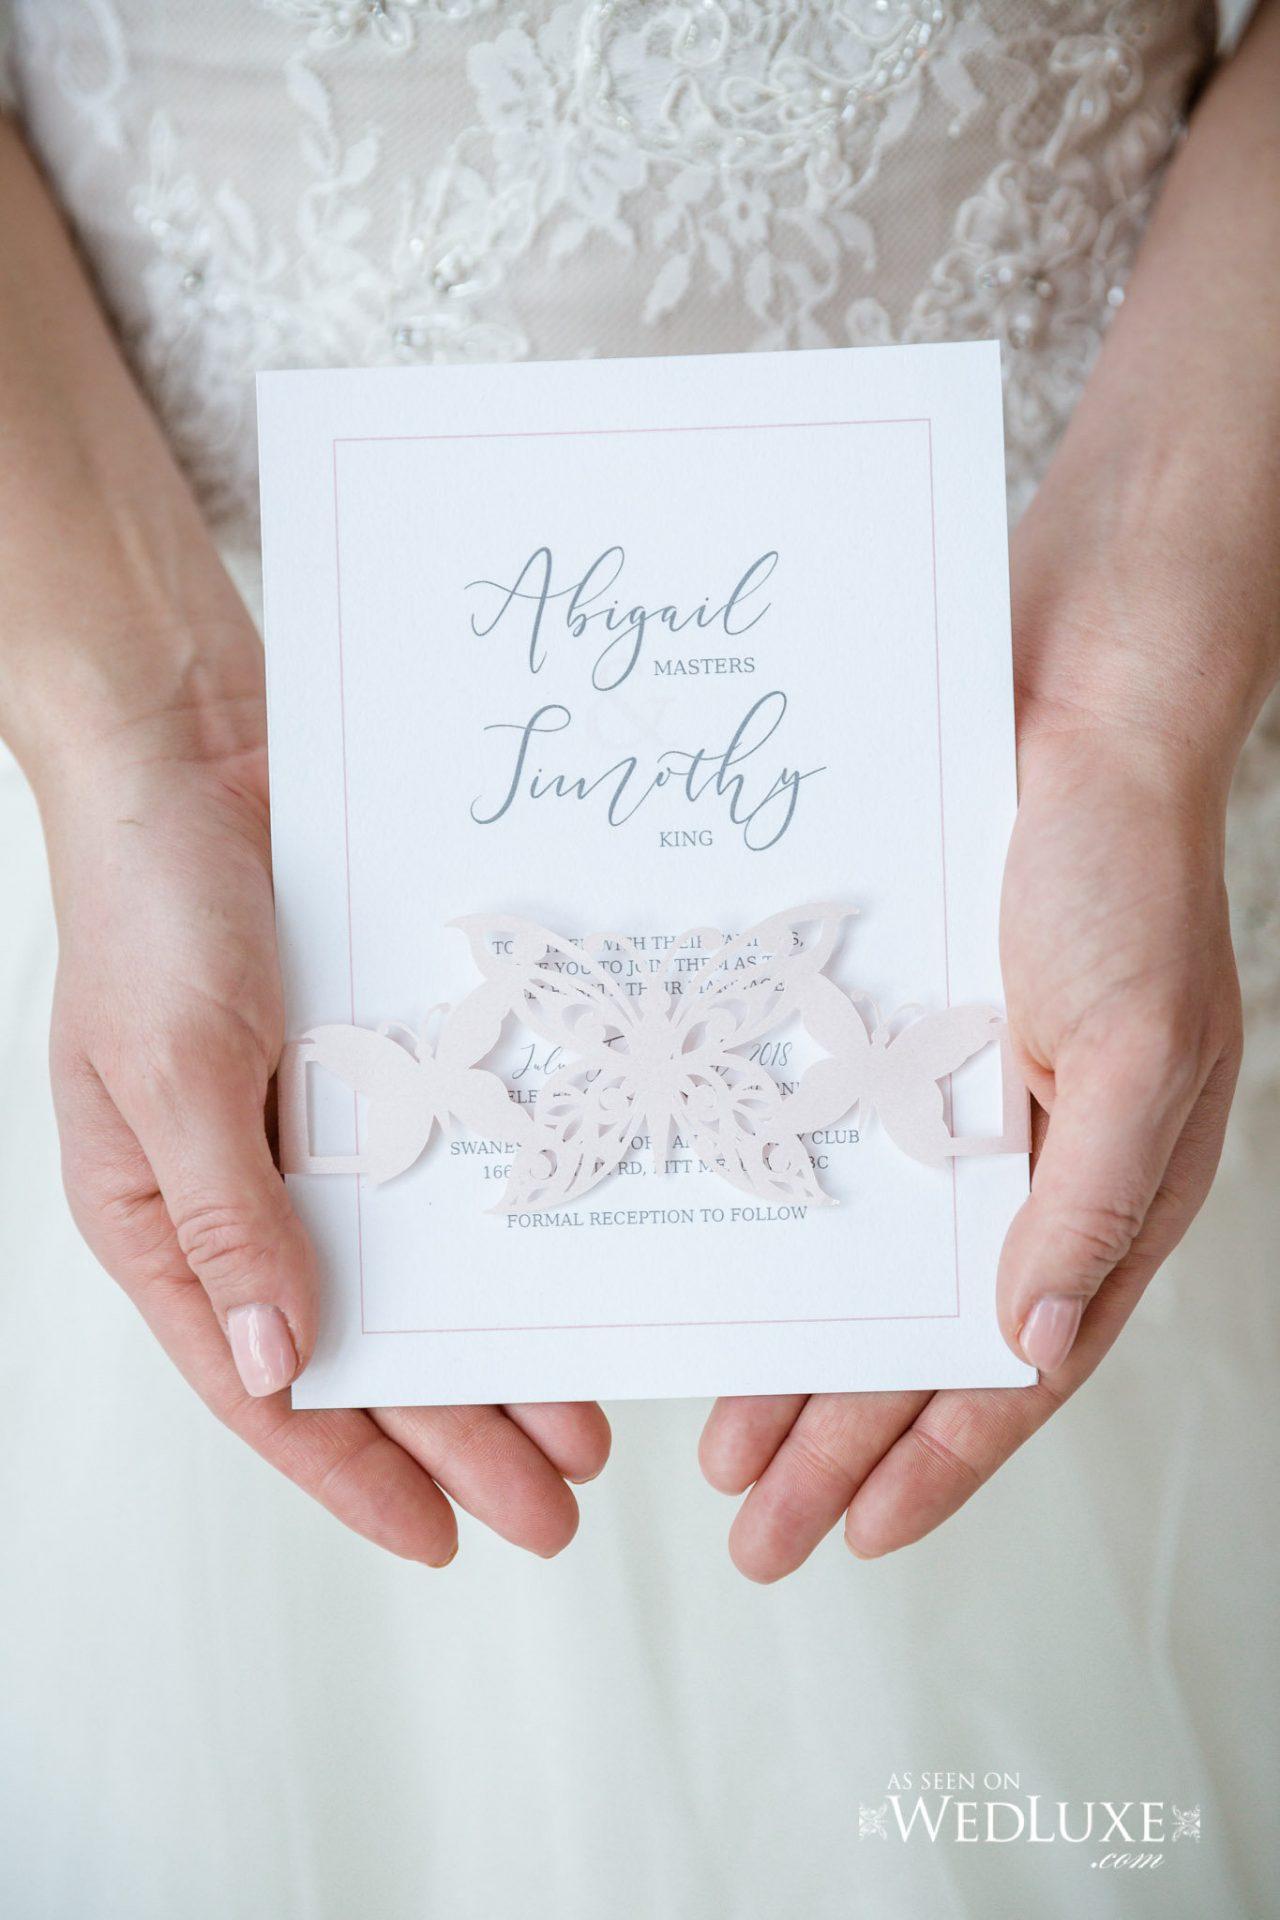 Etiquette—inside the envelope